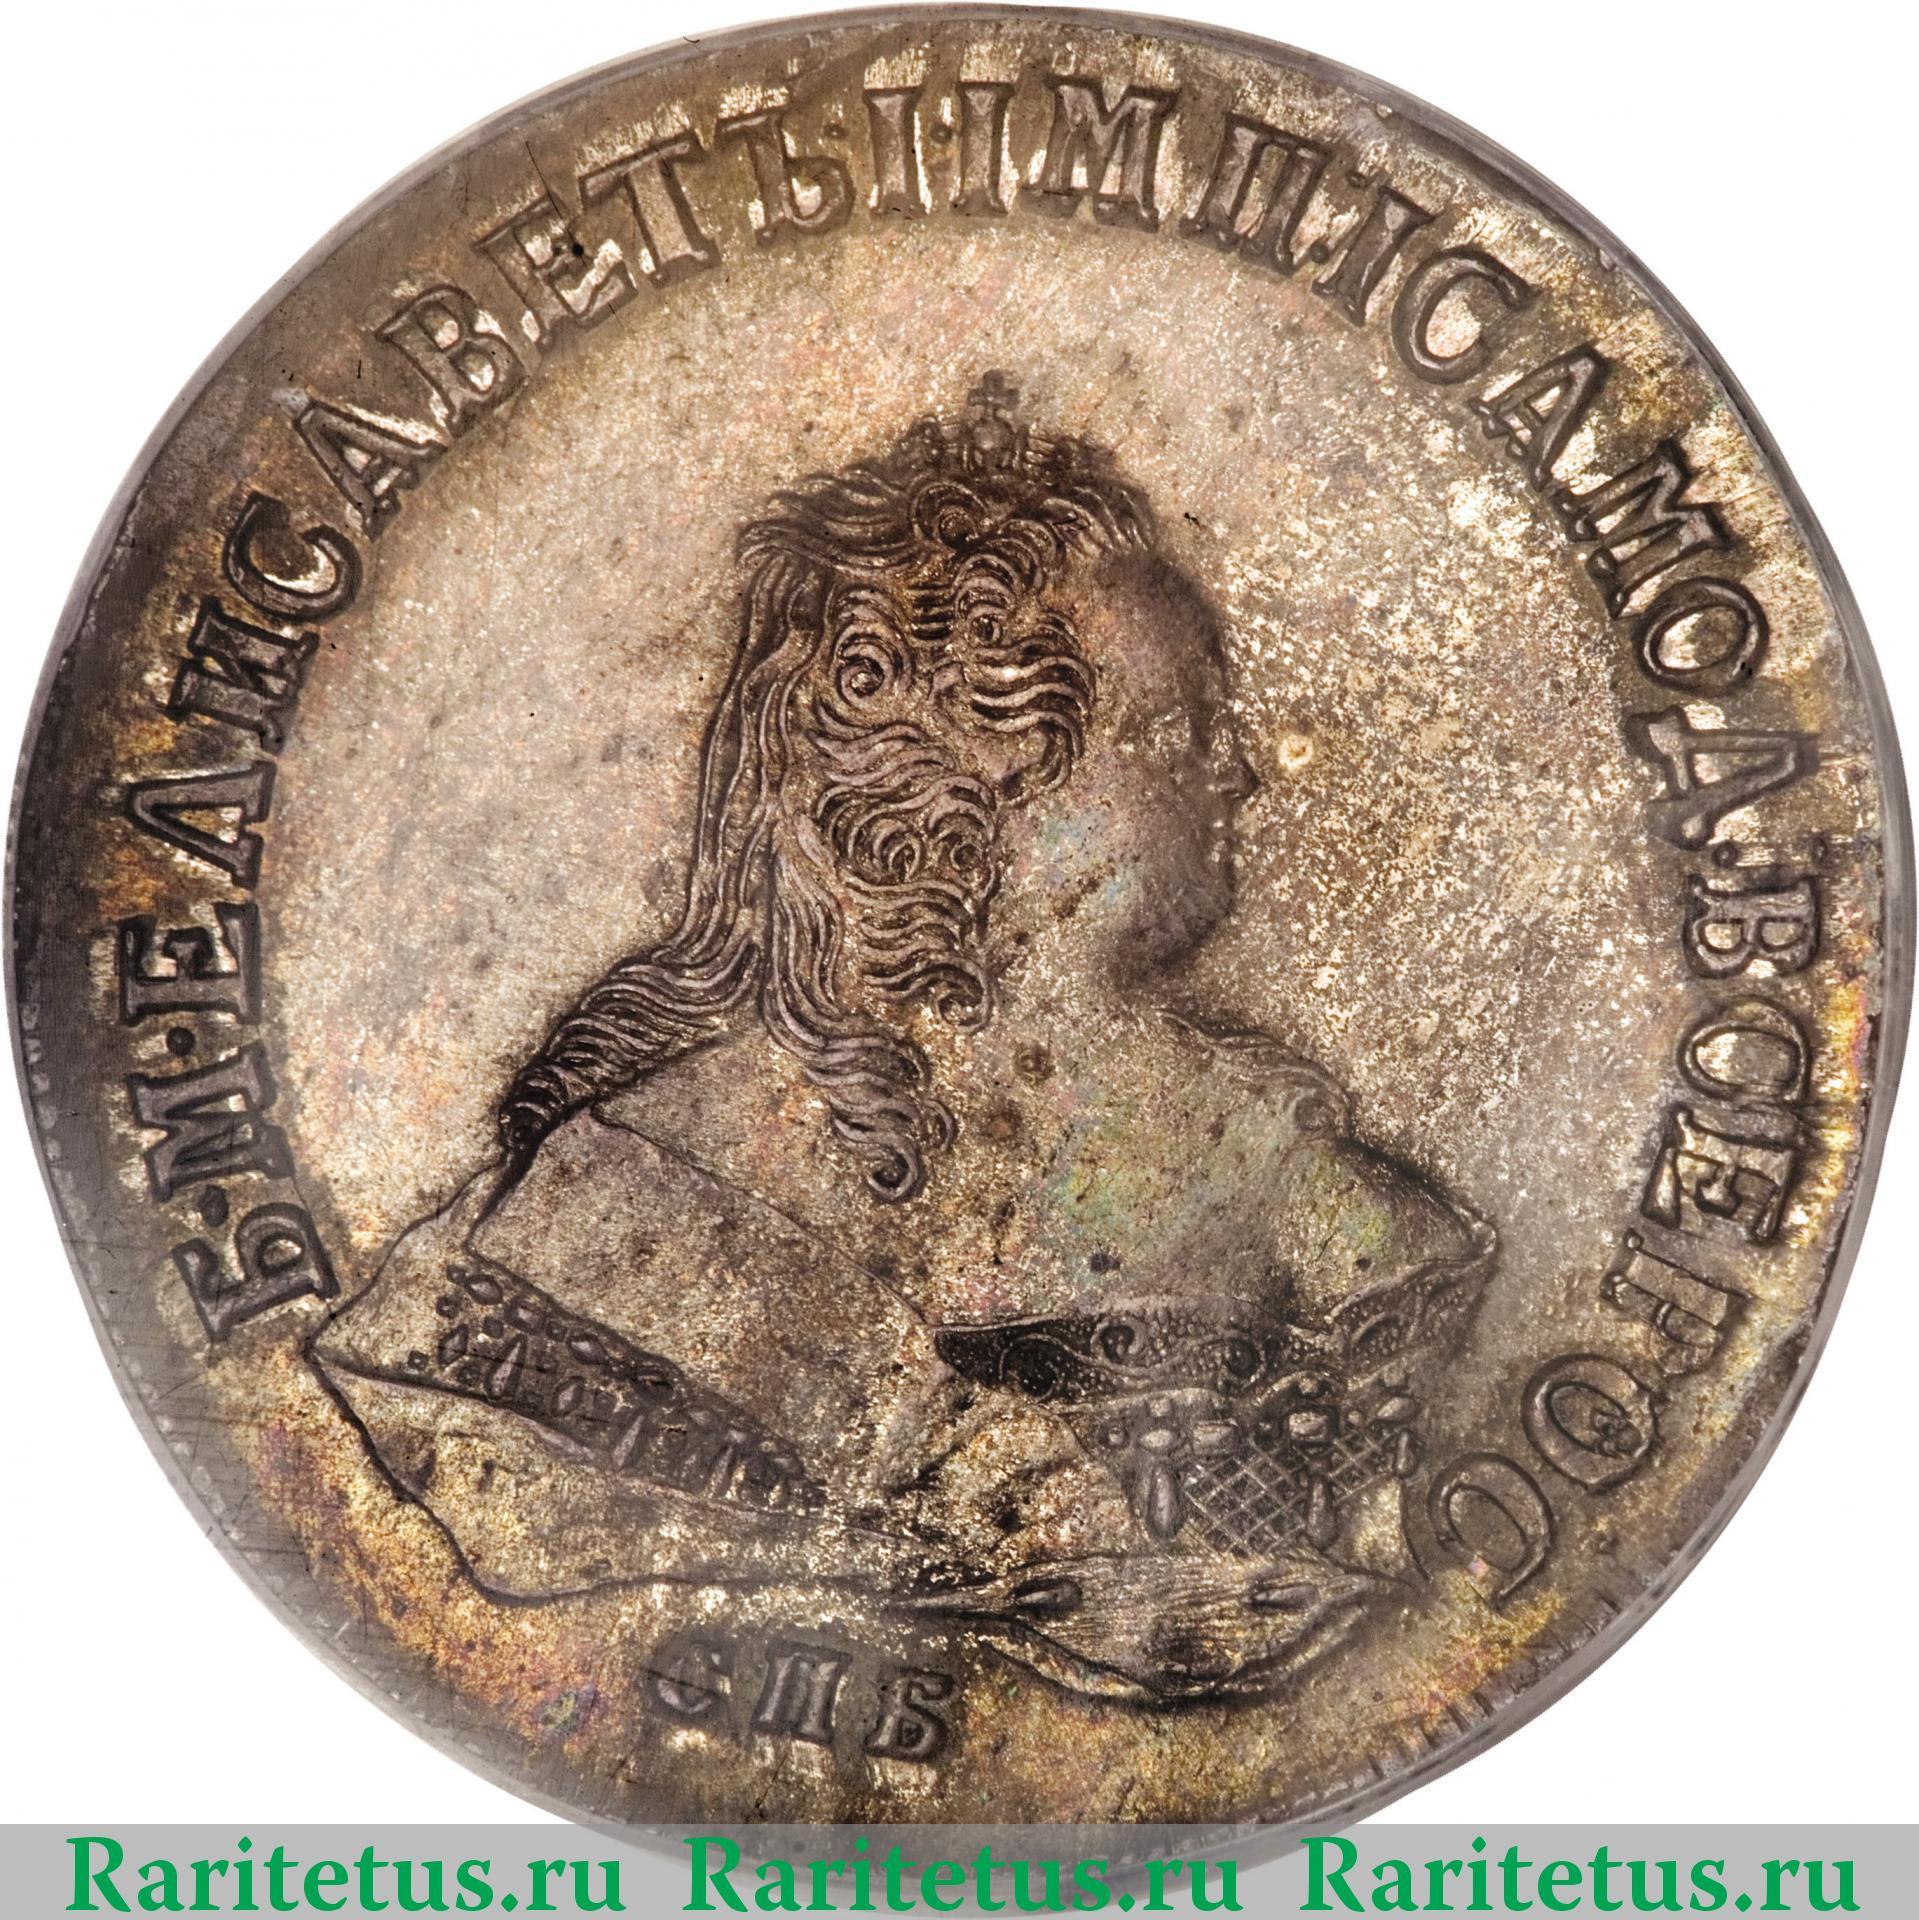 Монета рубль 1751 холдеры под монету